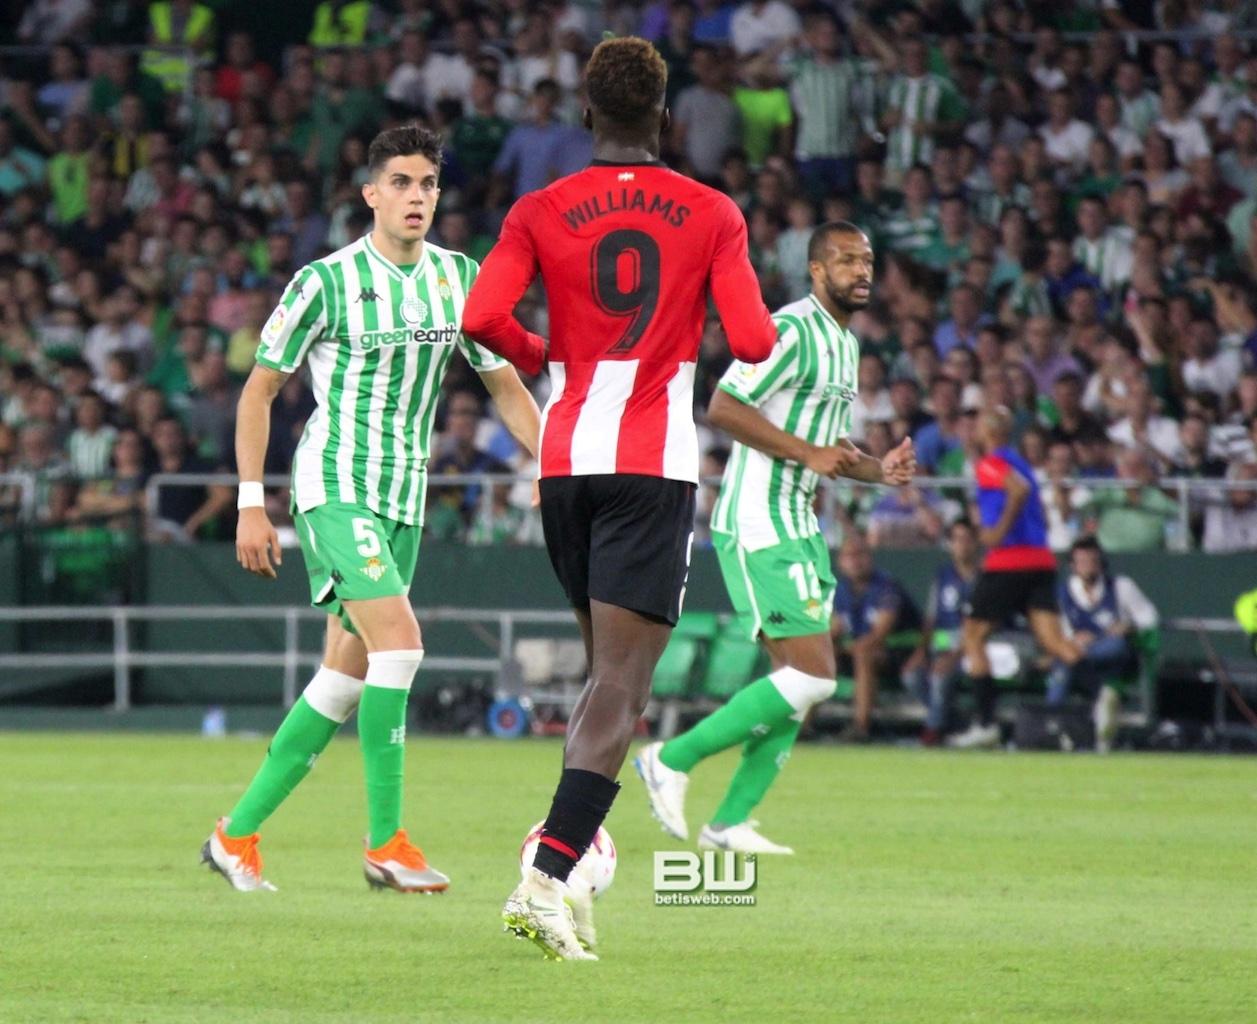 J5 Betis-Bilbao (90)